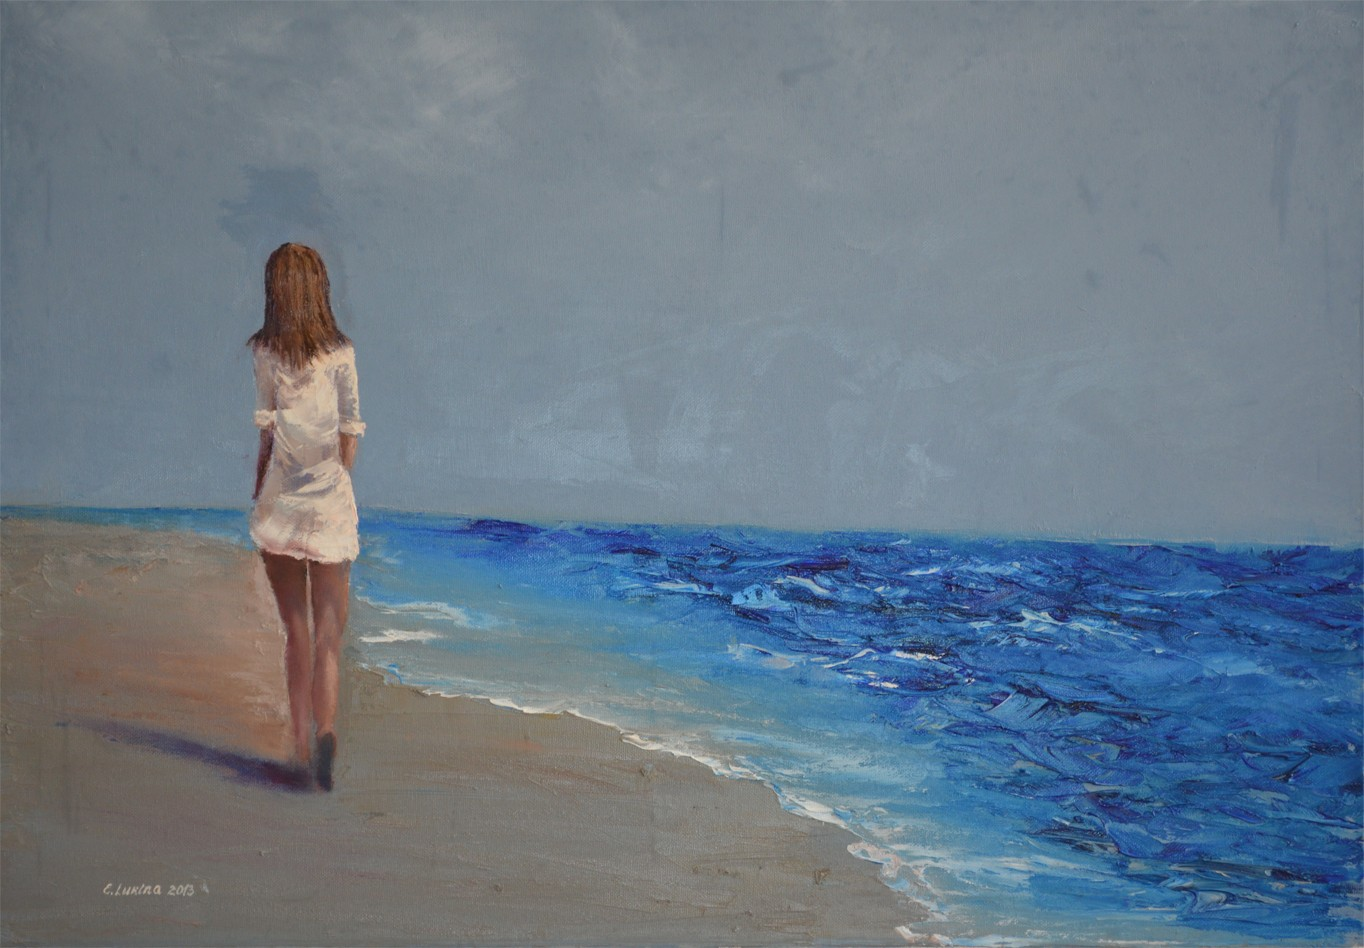 Картинки девушка у моря со спины карандашом, дню матери стихи